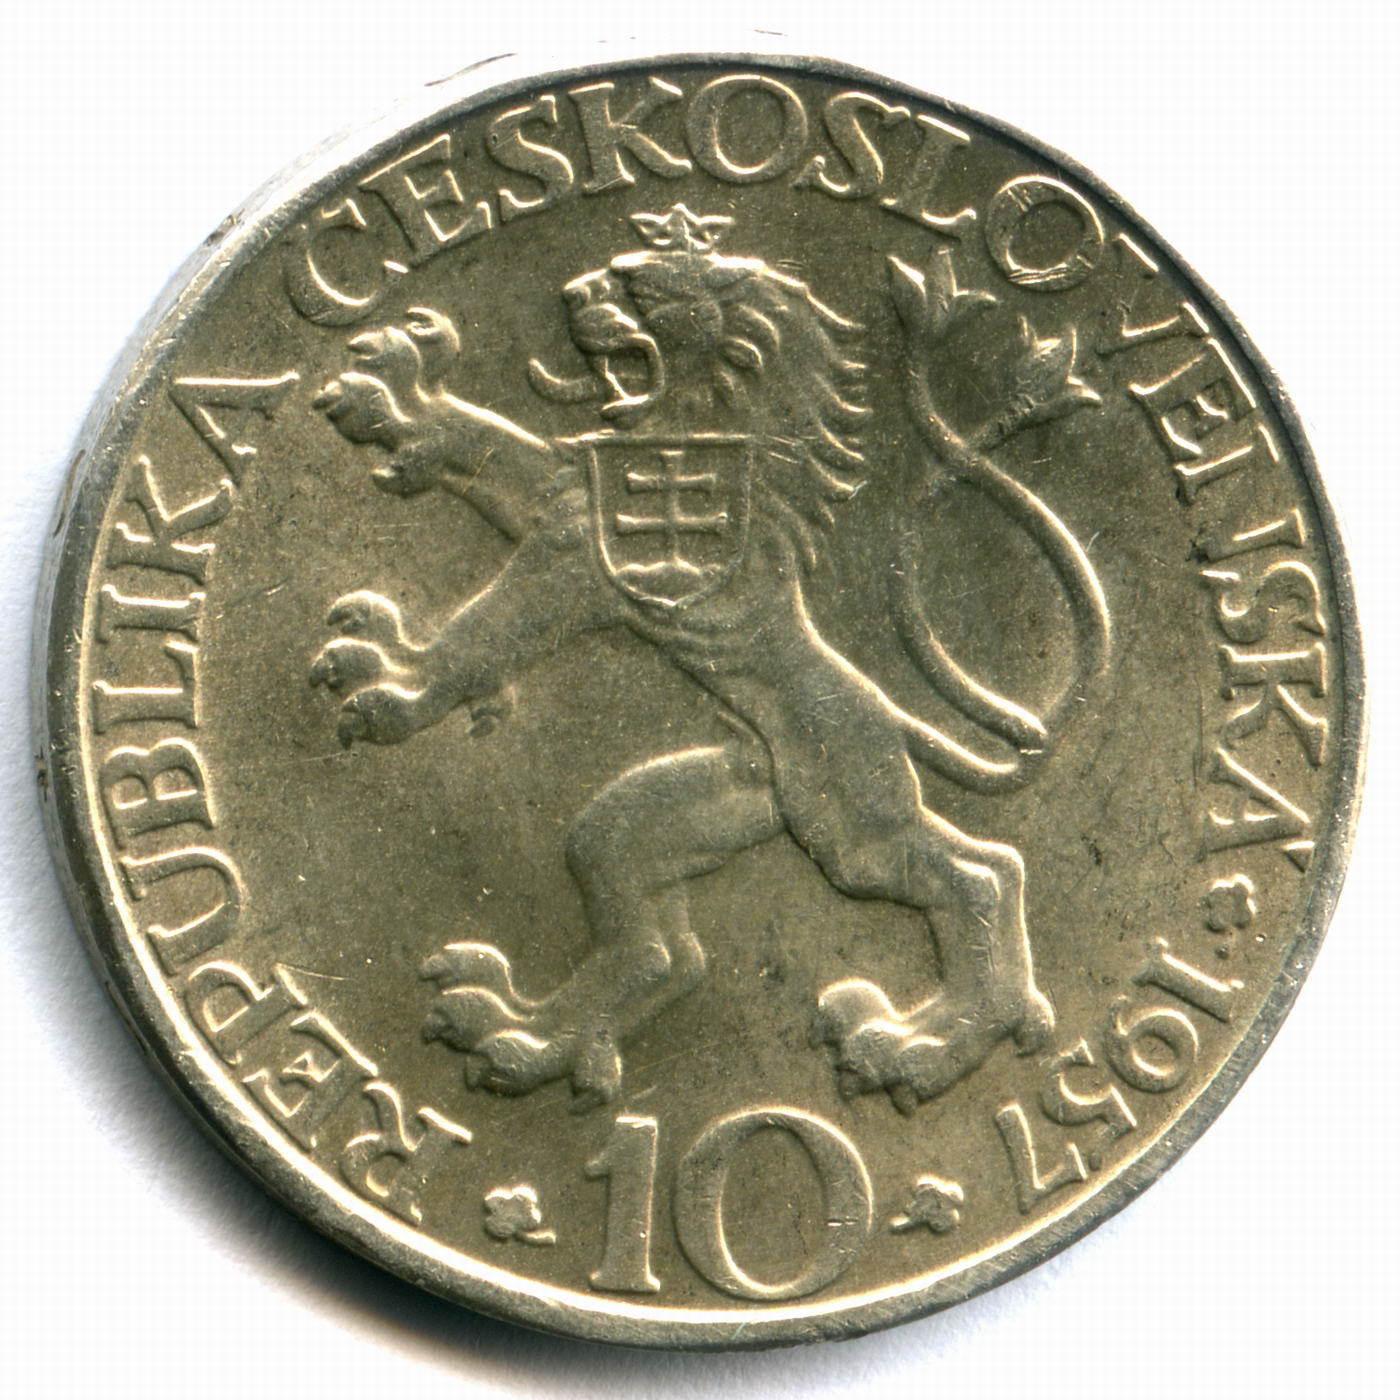 10 крон 1957. Чехословакия